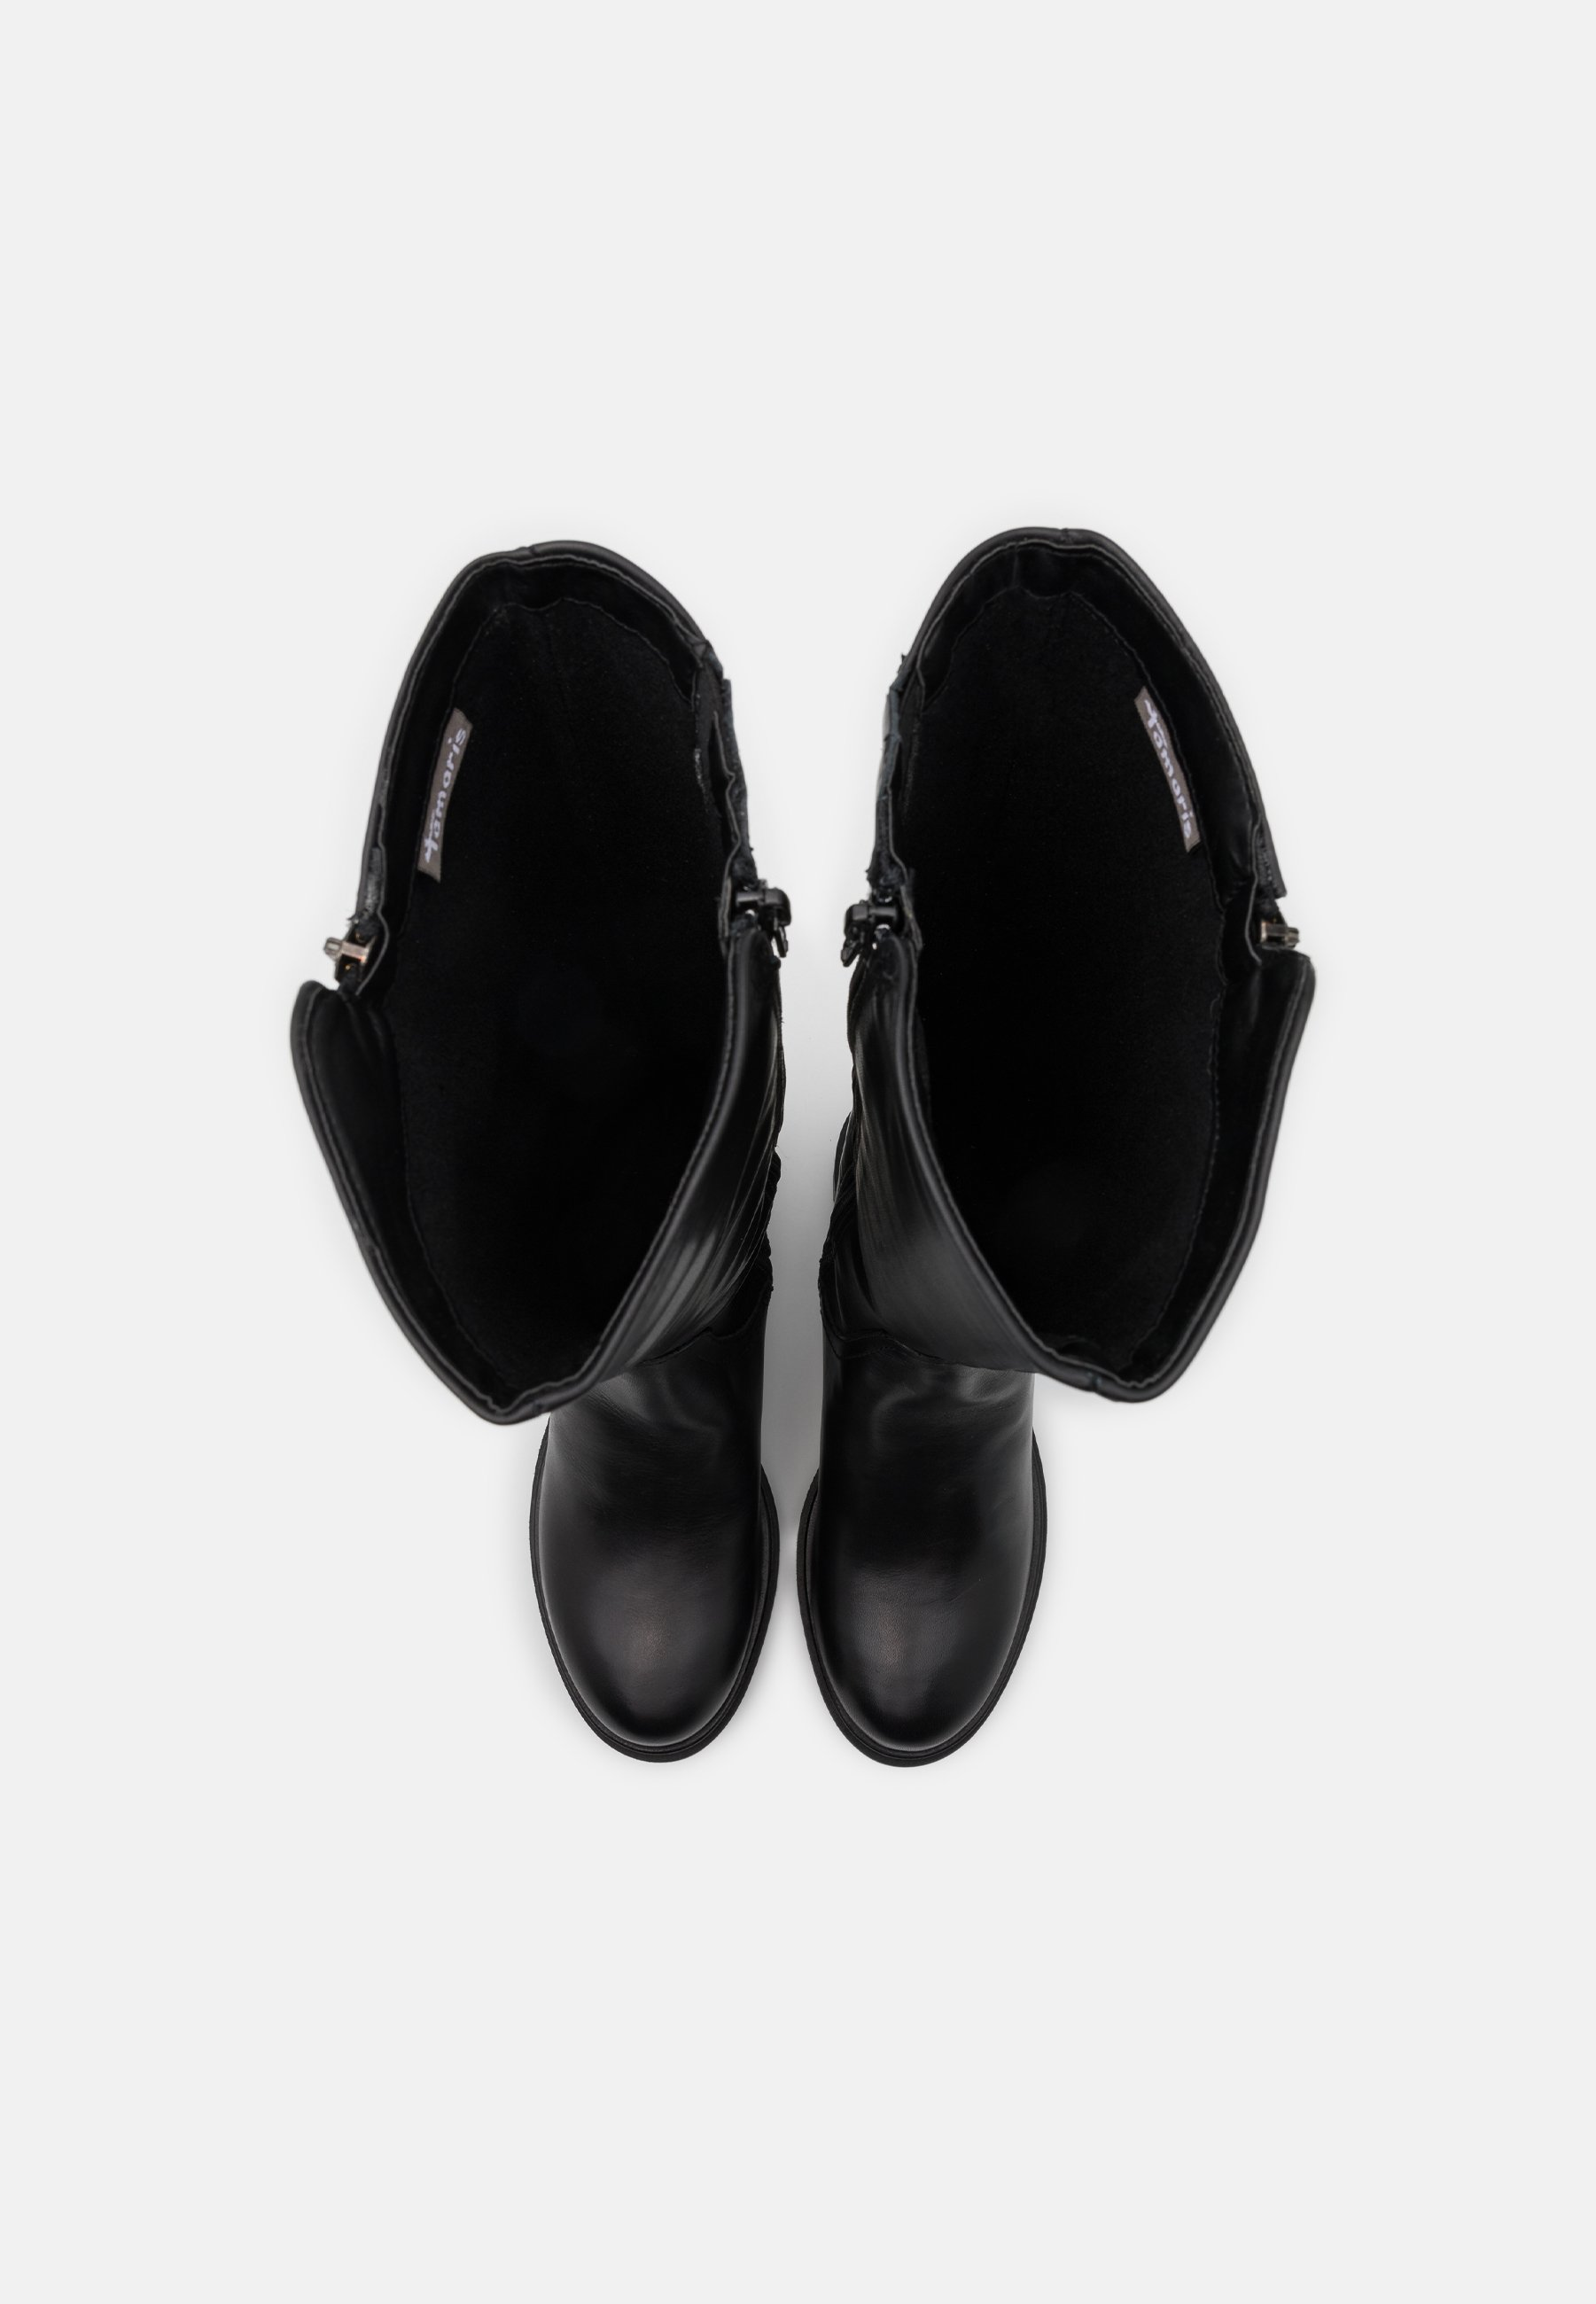 Tamaris Boots - Støvler Black/svart